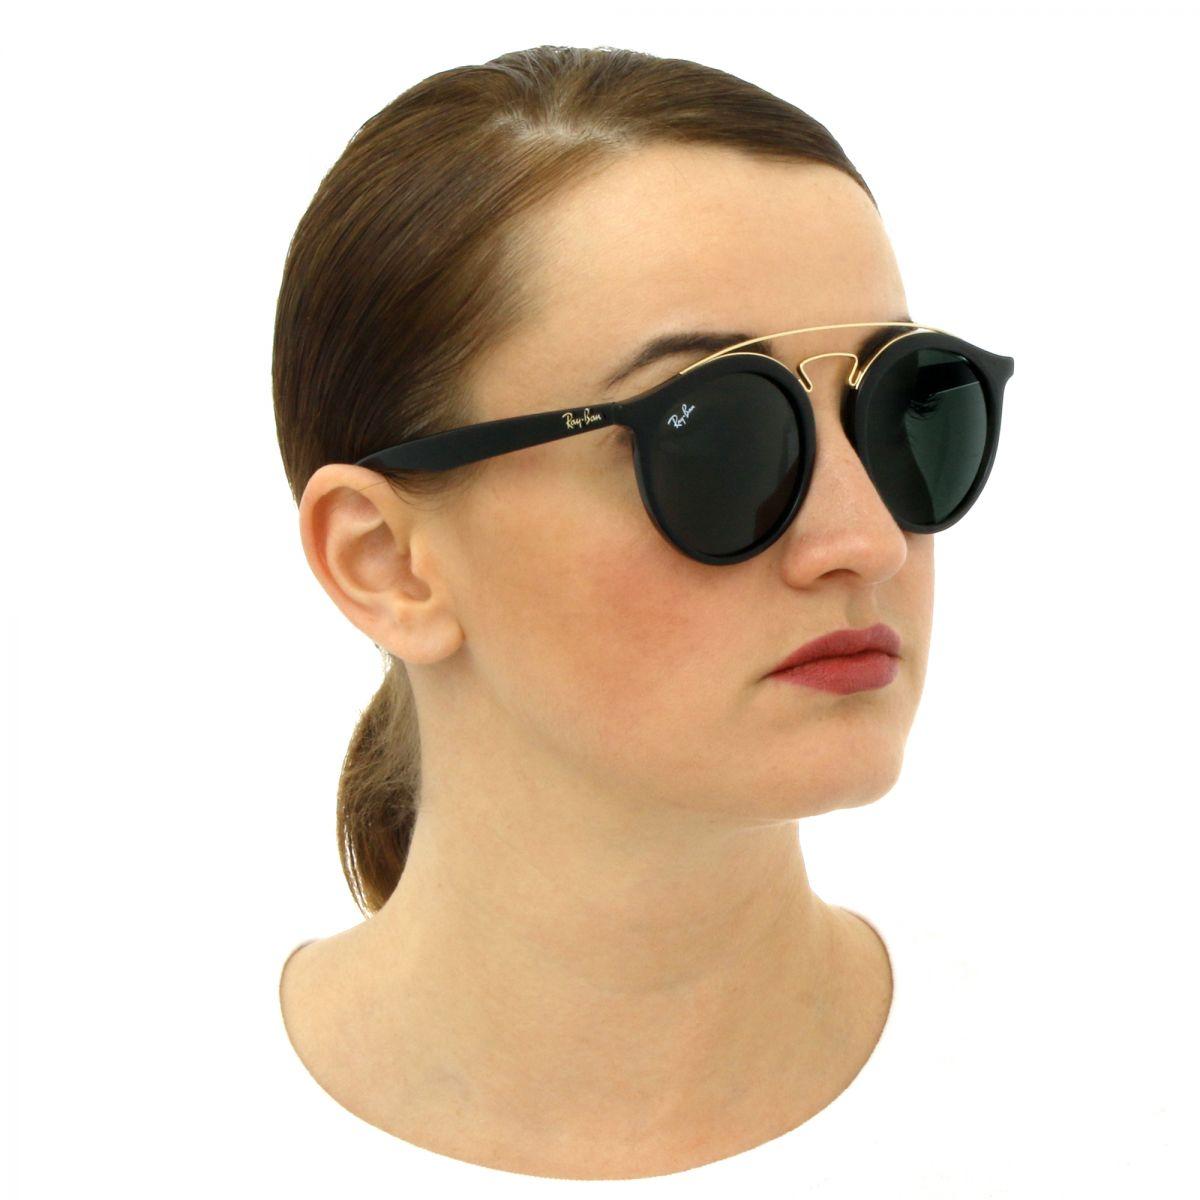 7b1eb9f688e Ray-Ban RB4256 Gatsby I Sunglasses RB4256-601 71-49 - WATCH